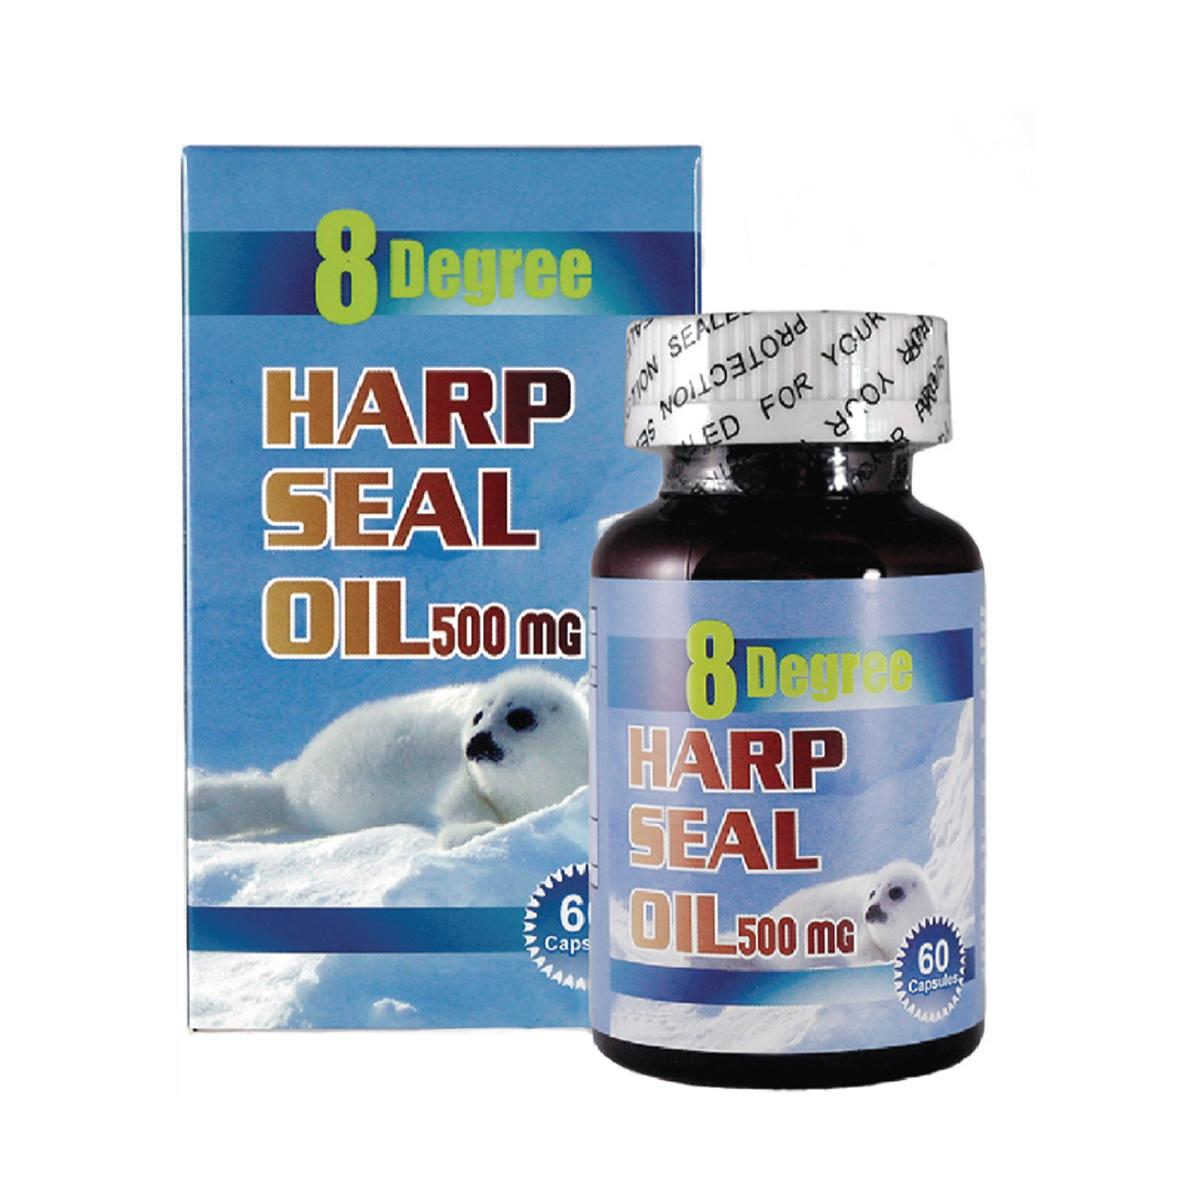 Harp Seal Oil 500mg